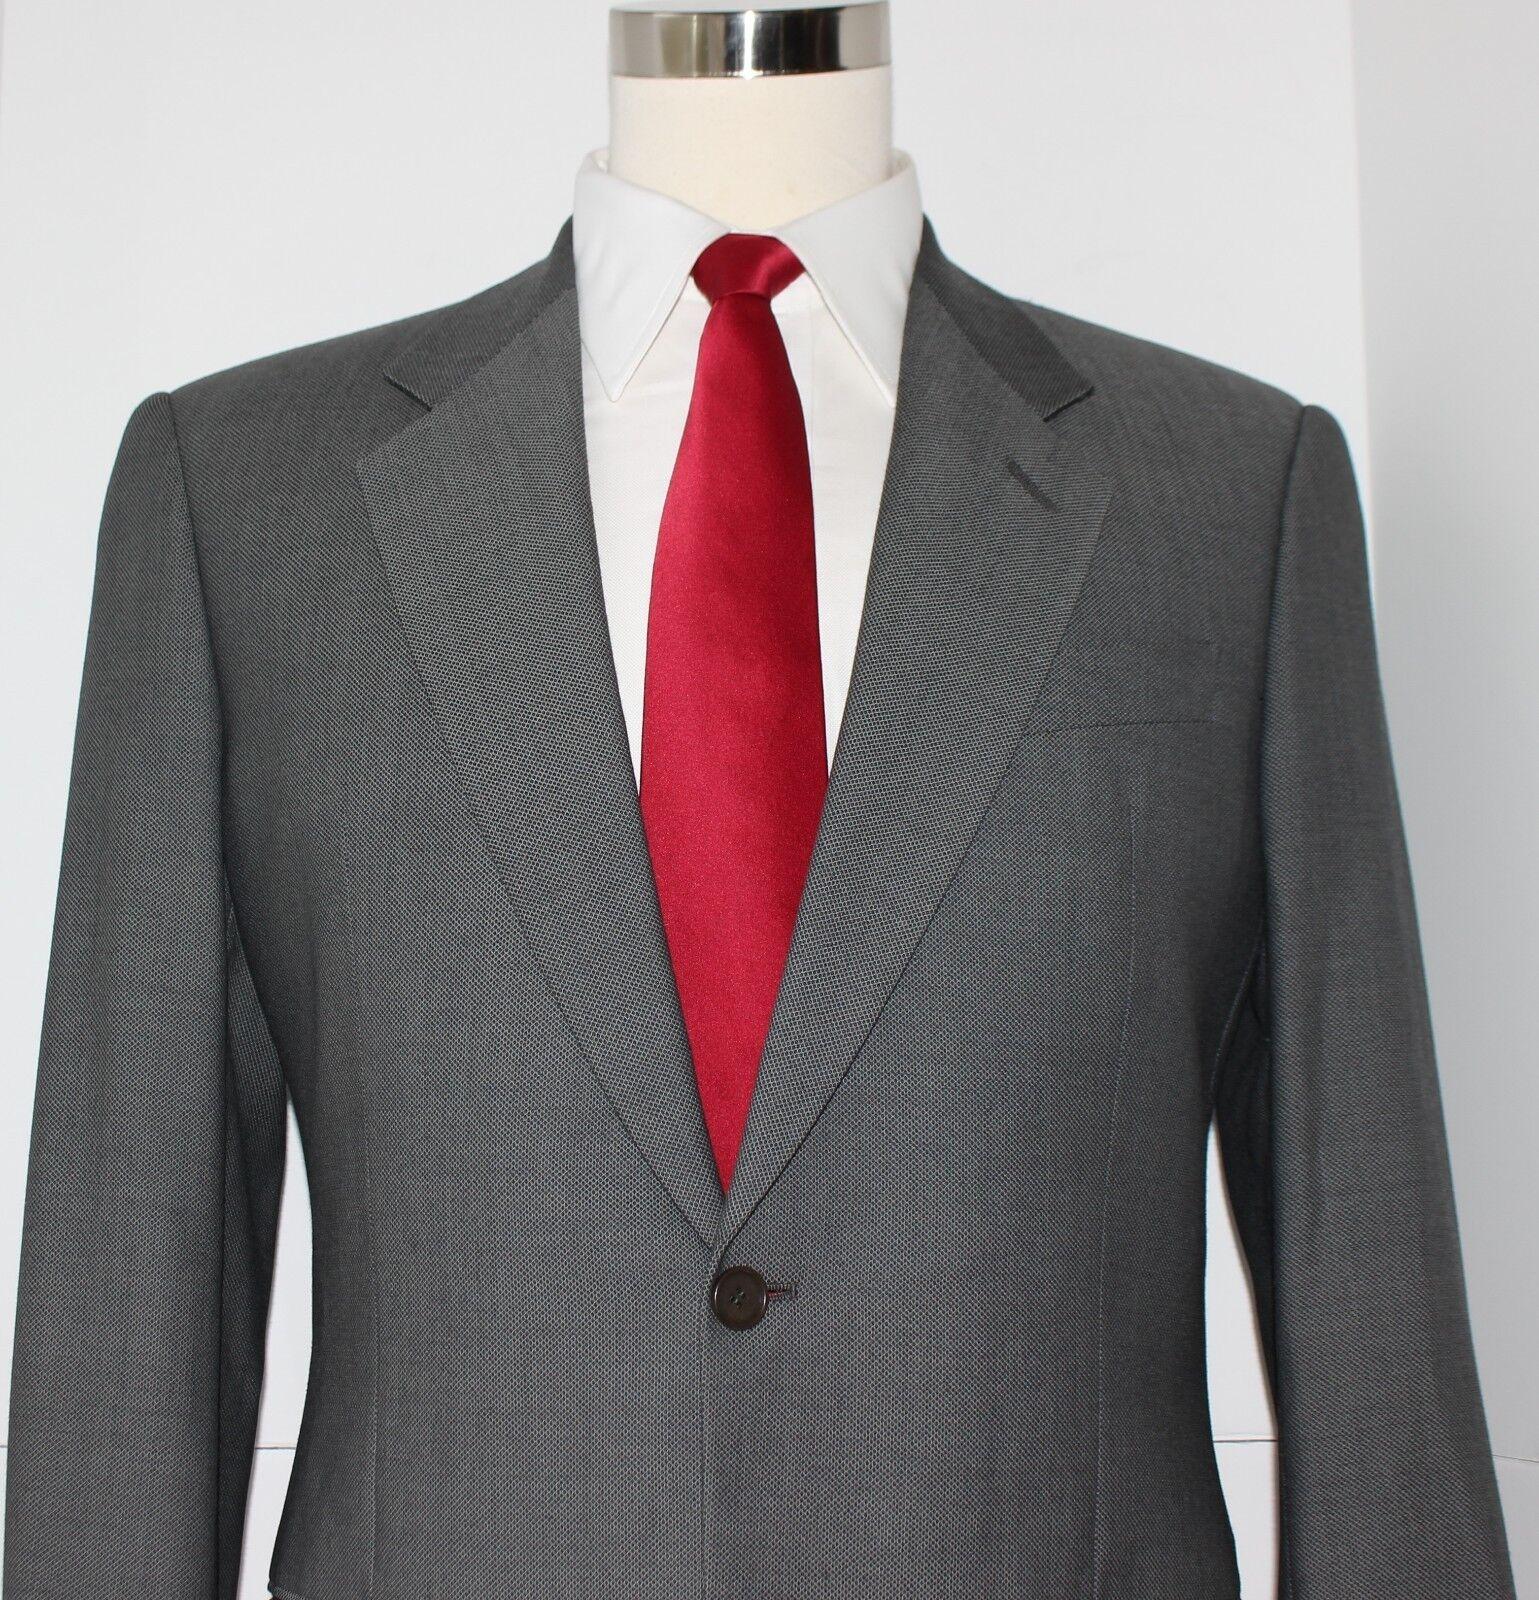 Giorgio Armani Collezioni One Button grau Nailhead Wool Suit 39 R 31 30 Pants